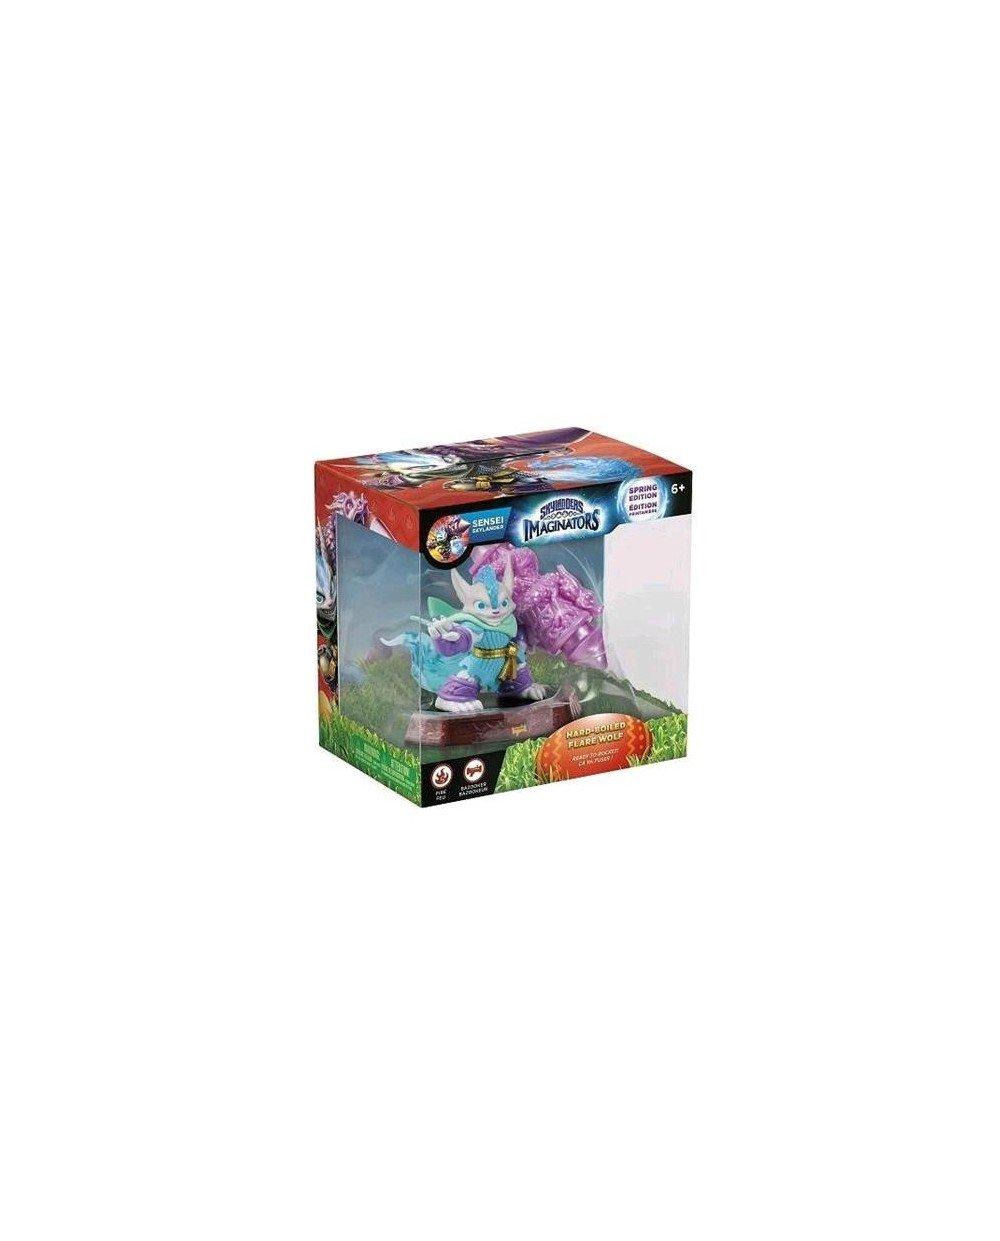 SKYLANDERS IMAGINATORS SENSEI FLARE WOLF 하드 삶은(PS4 | PS3 | XBOX360 | XBOX ONE | NINTENDO WII U)